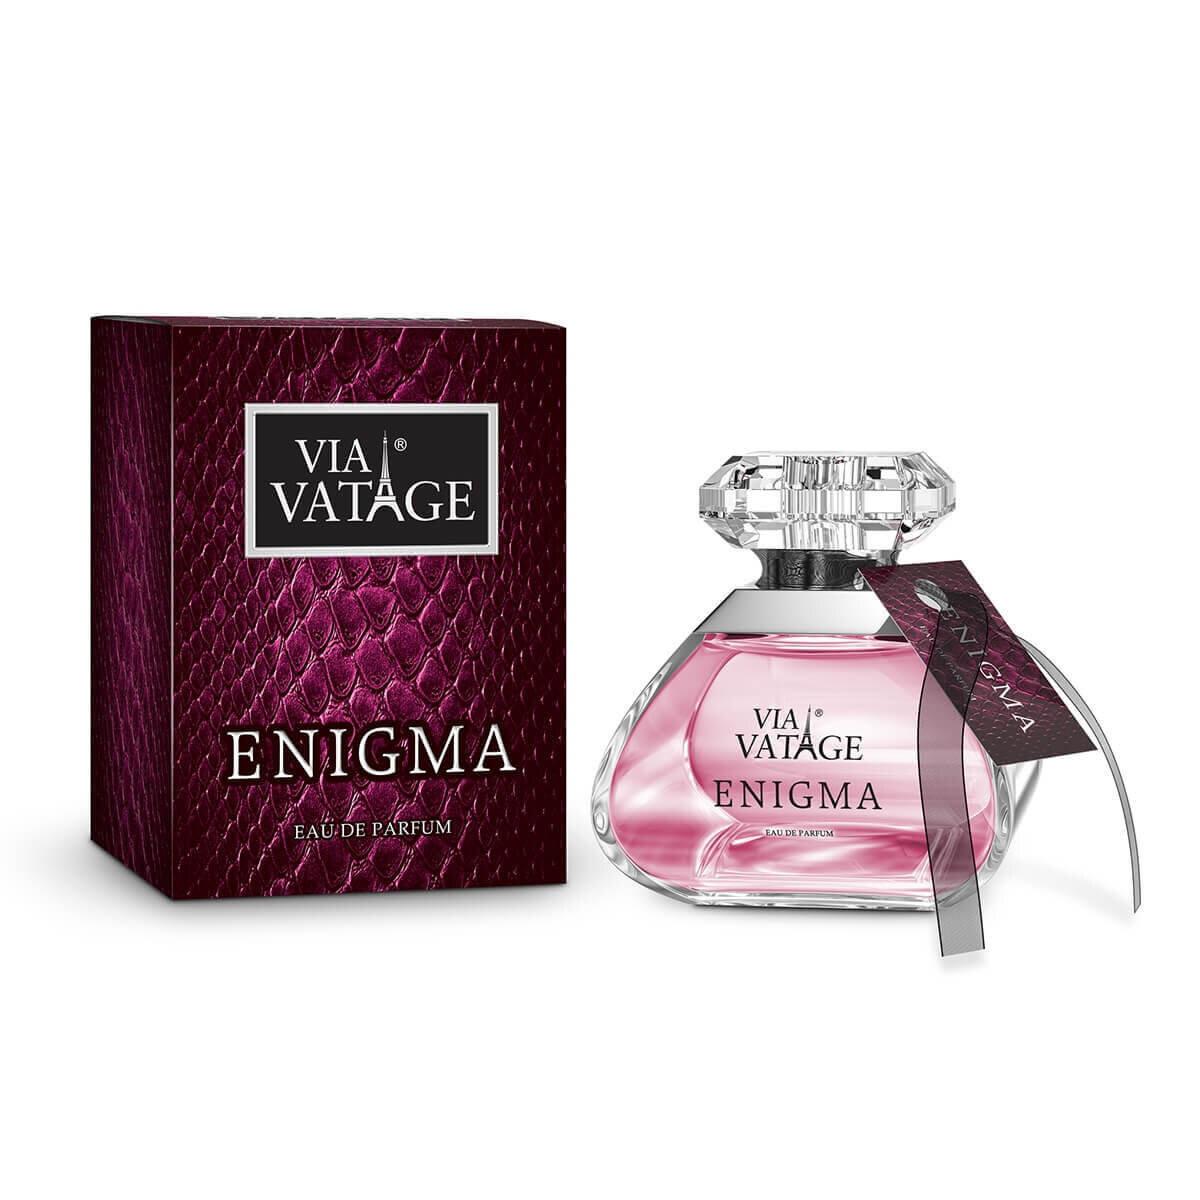 Enigma 100 ml